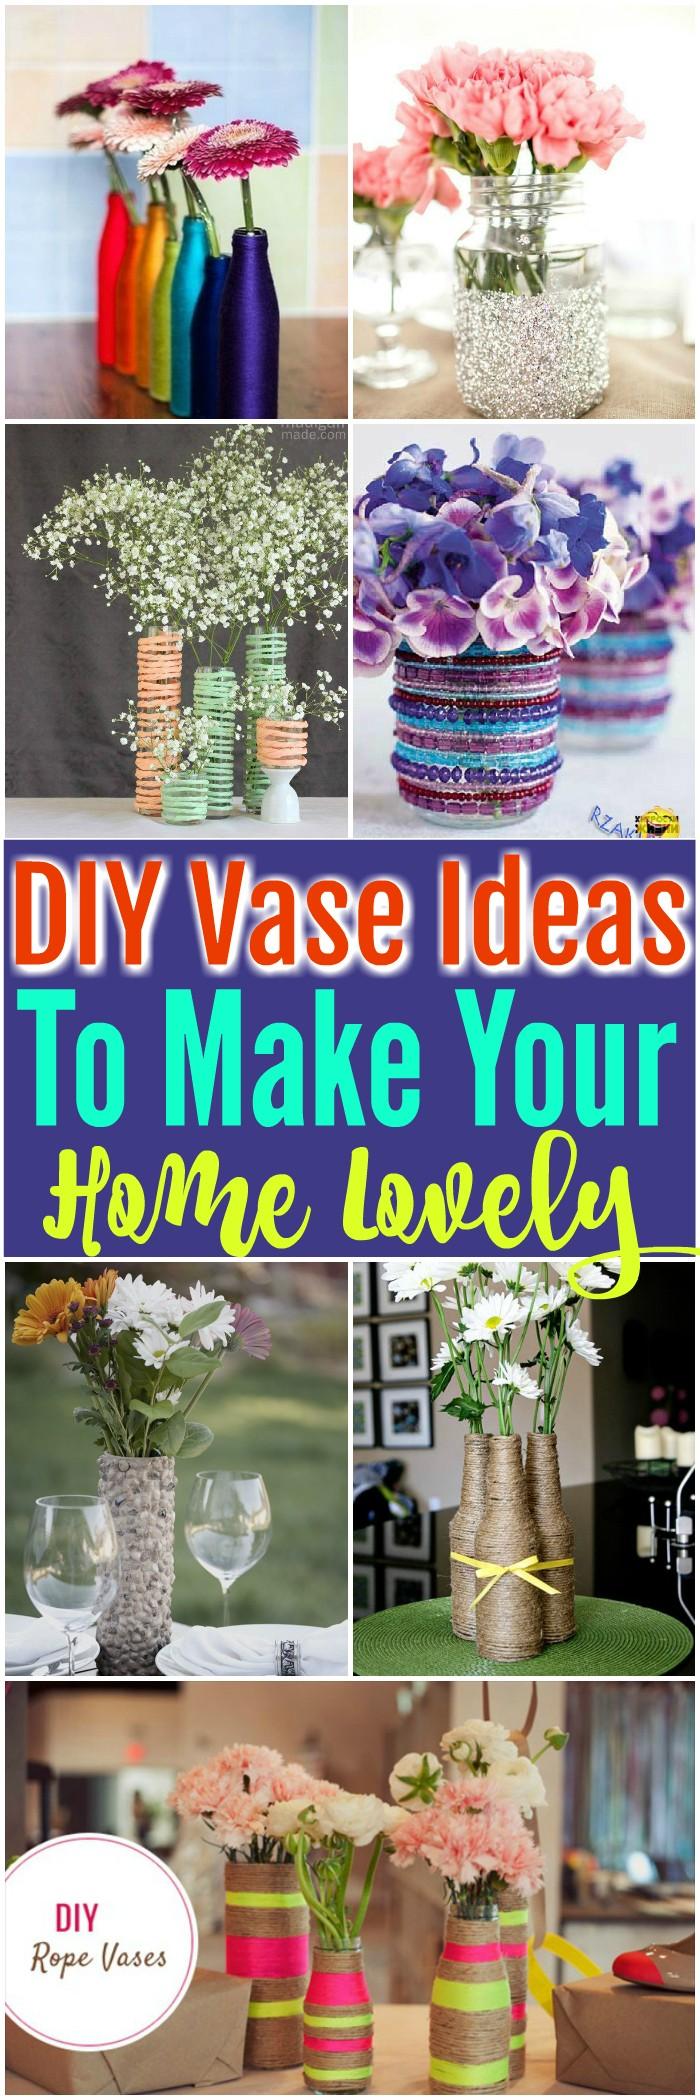 DIY Vase Ideas 15 DIY Vase Ideas To Make Your Home Lovely